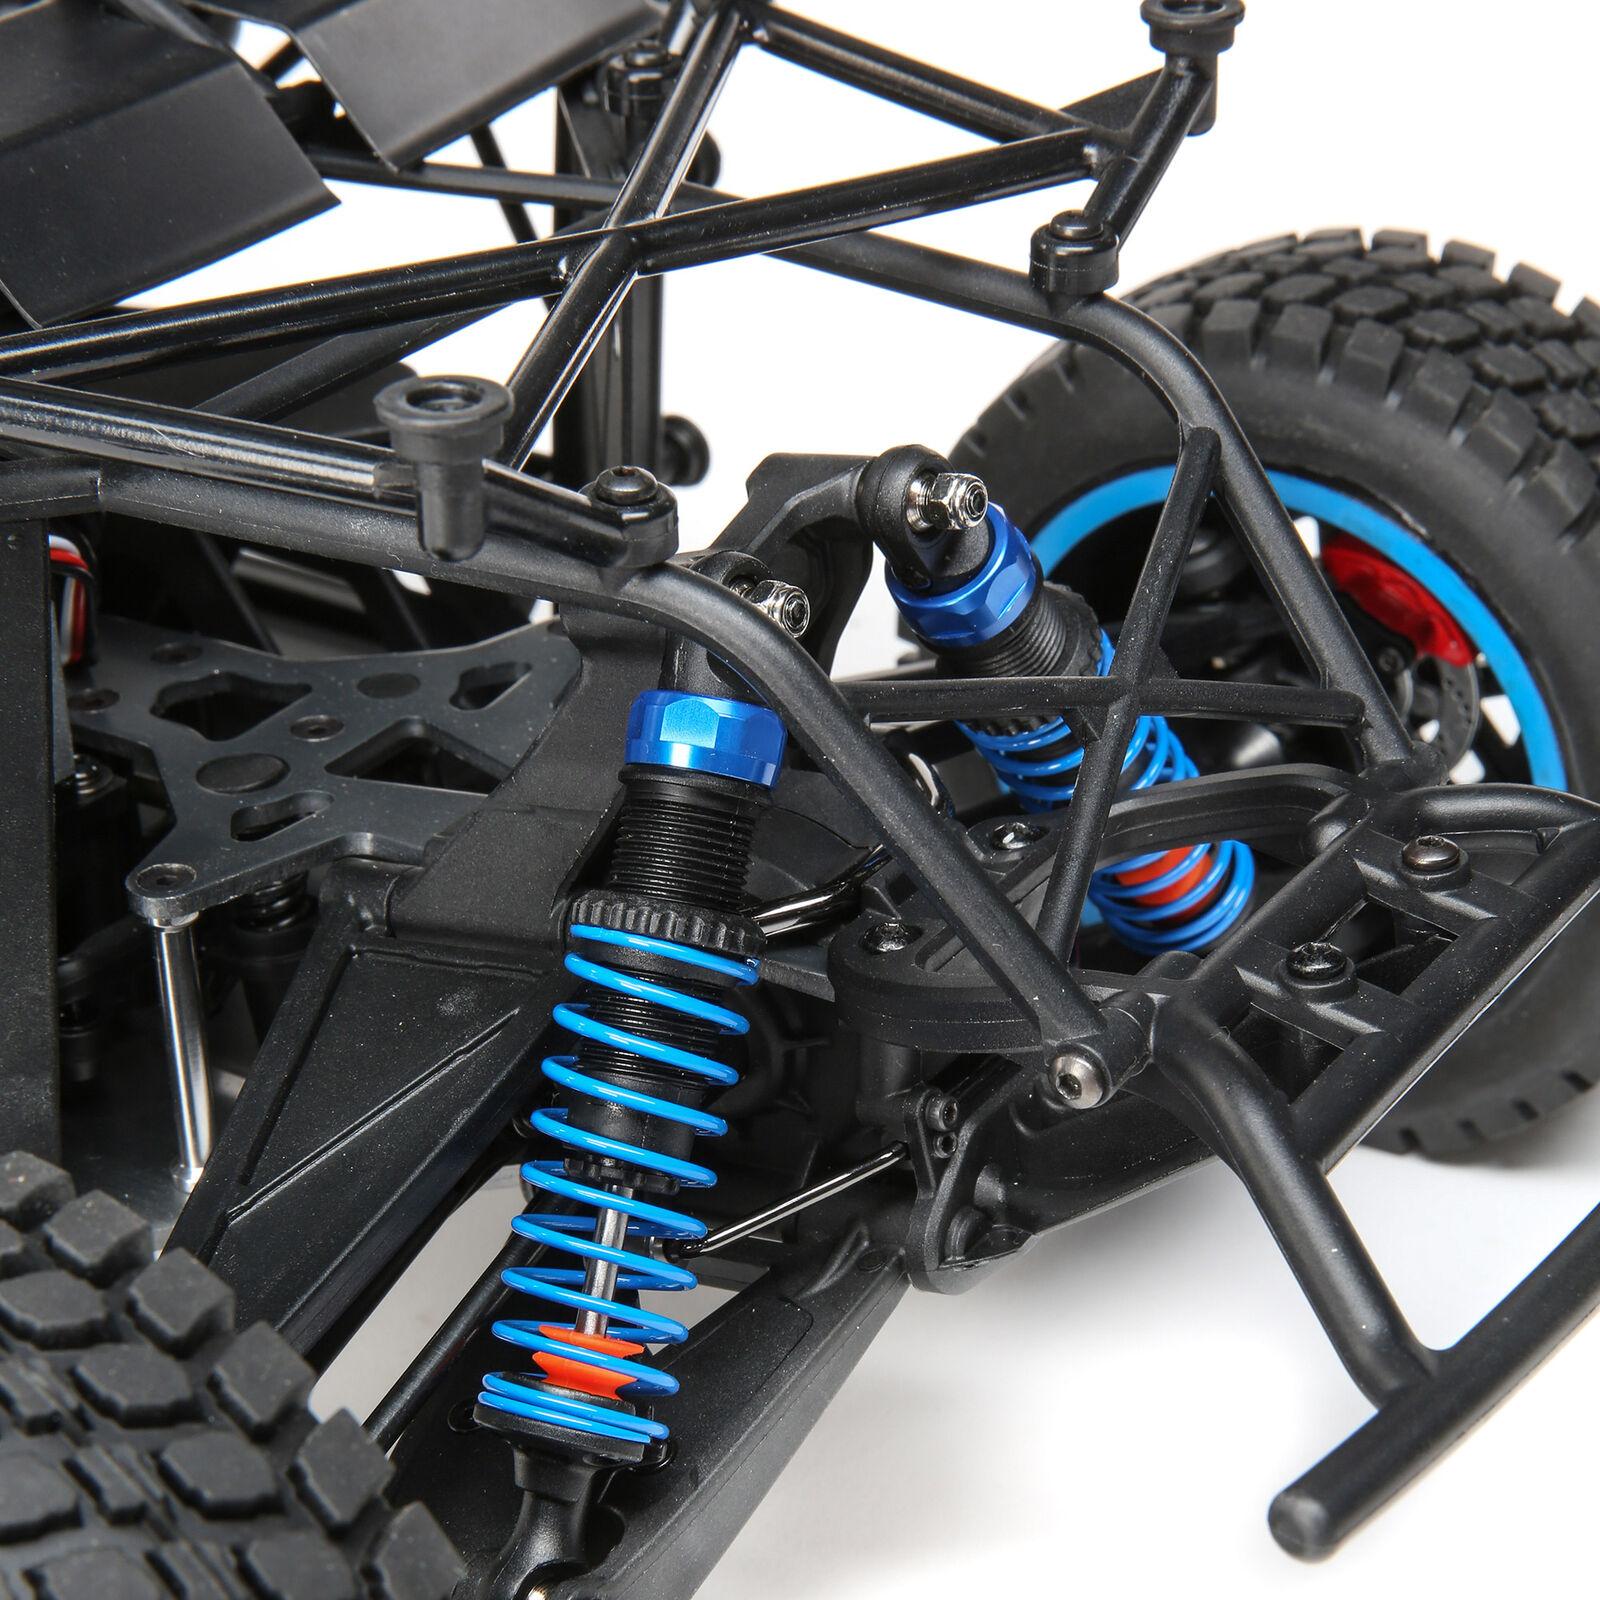 1/10 King Shocks Ford Raptor Baja Rey 4WD Brushless RTR with SMART